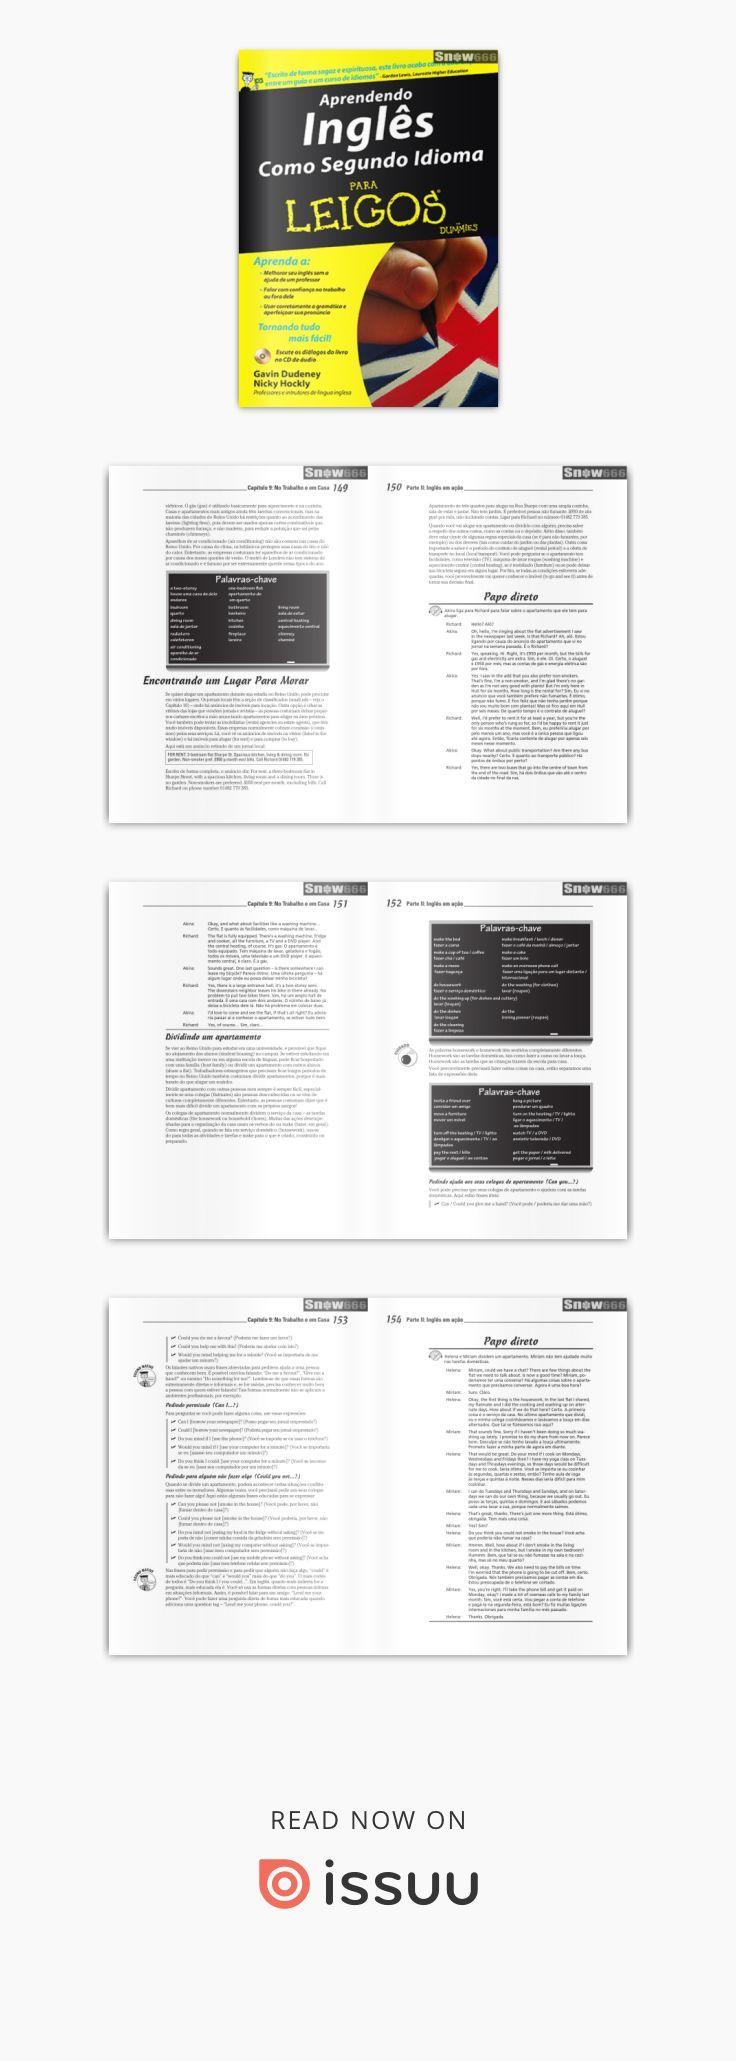 Livro Ingles Para Leigos Ingles Para Leigos Aprender Ingles E